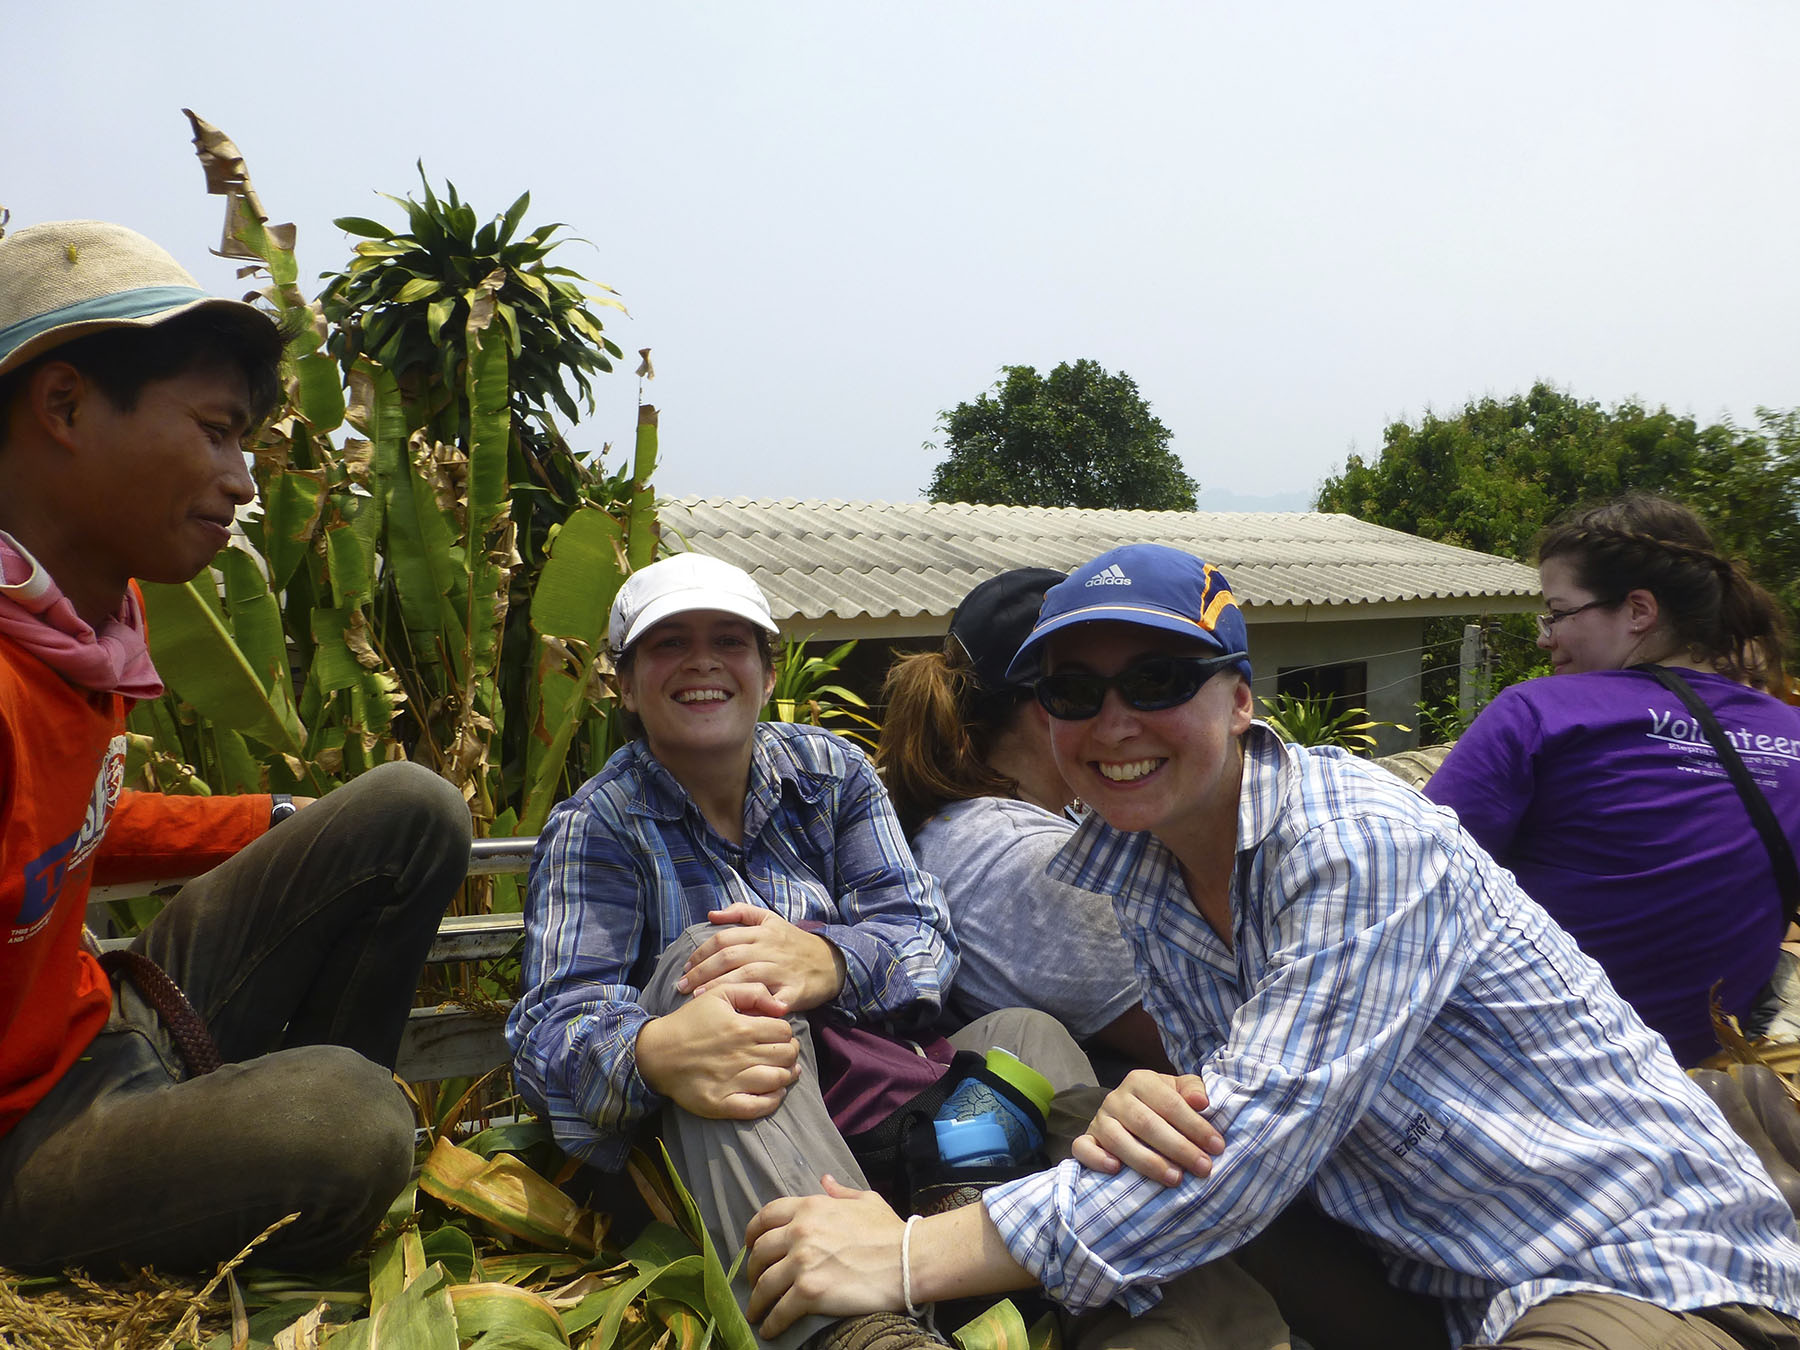 High On Life (And Corn Stalks)